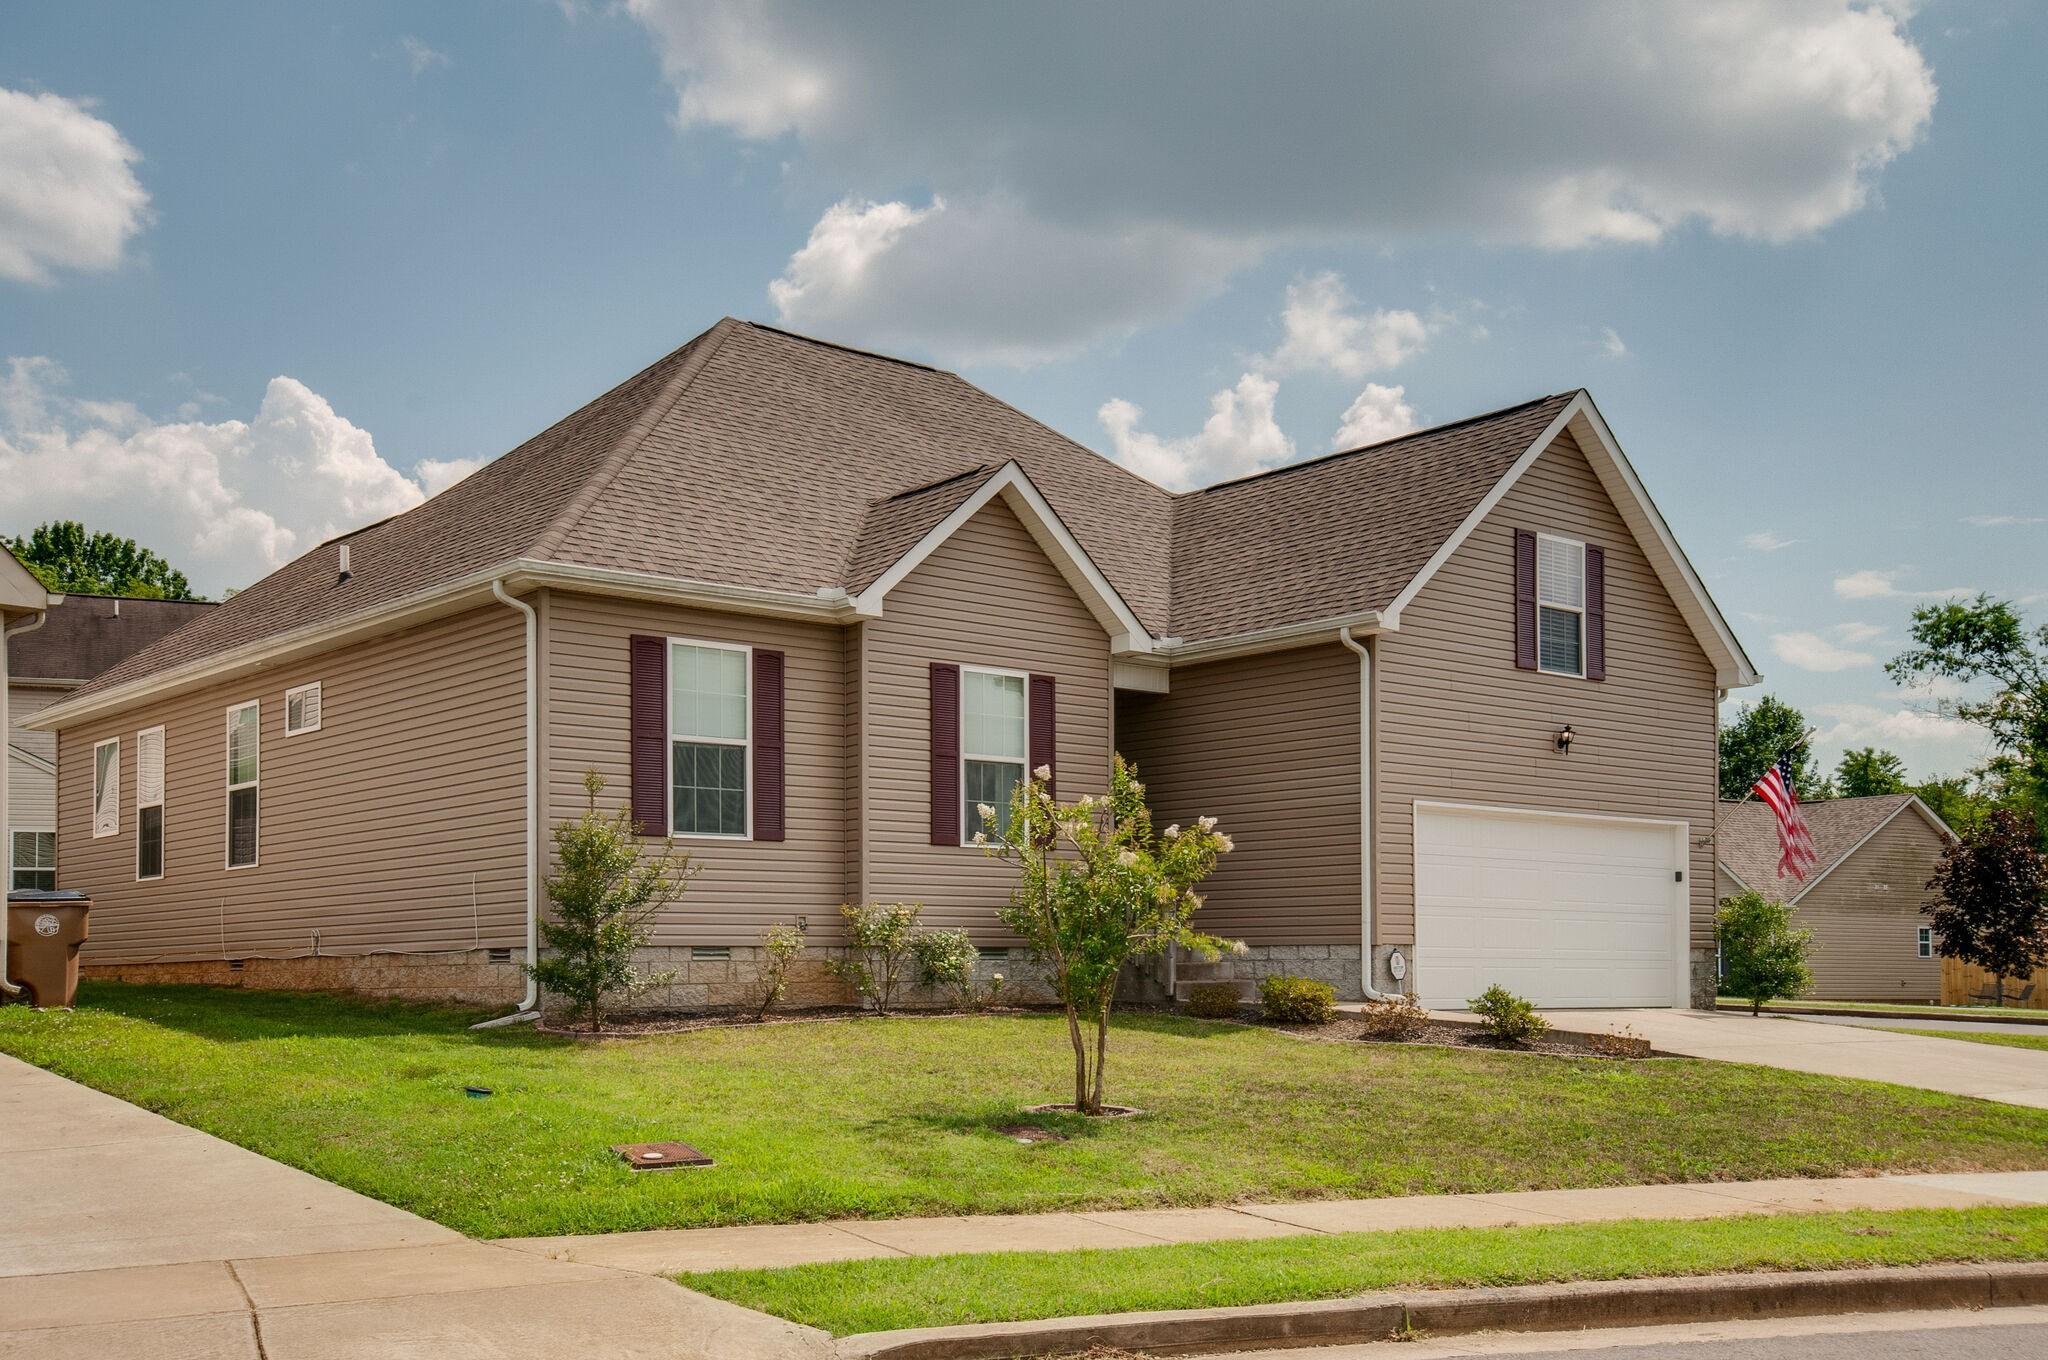 757 Maylene Dr Property Photo - Madison, TN real estate listing